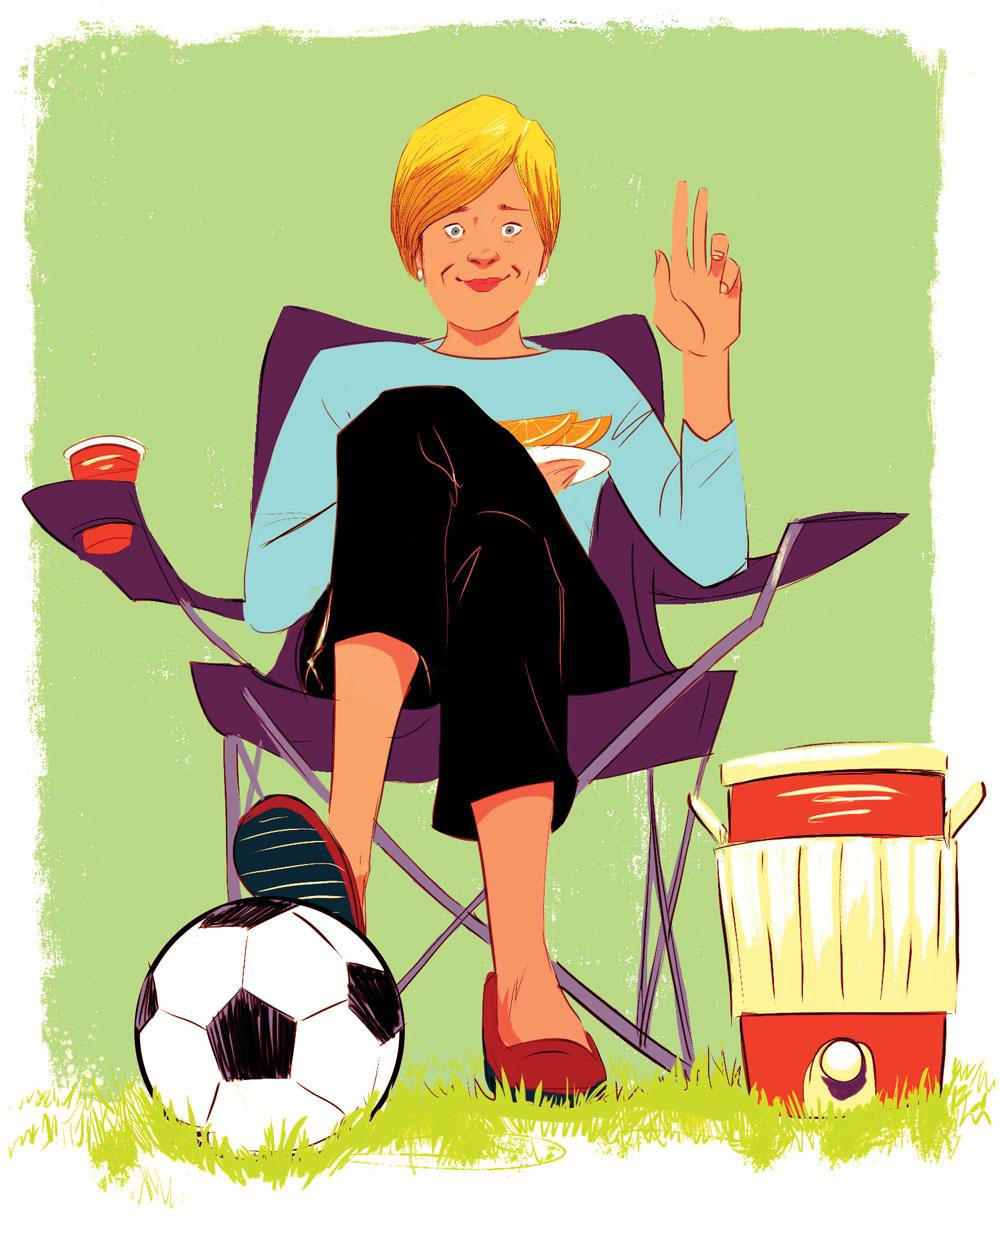 Soccer mom lament